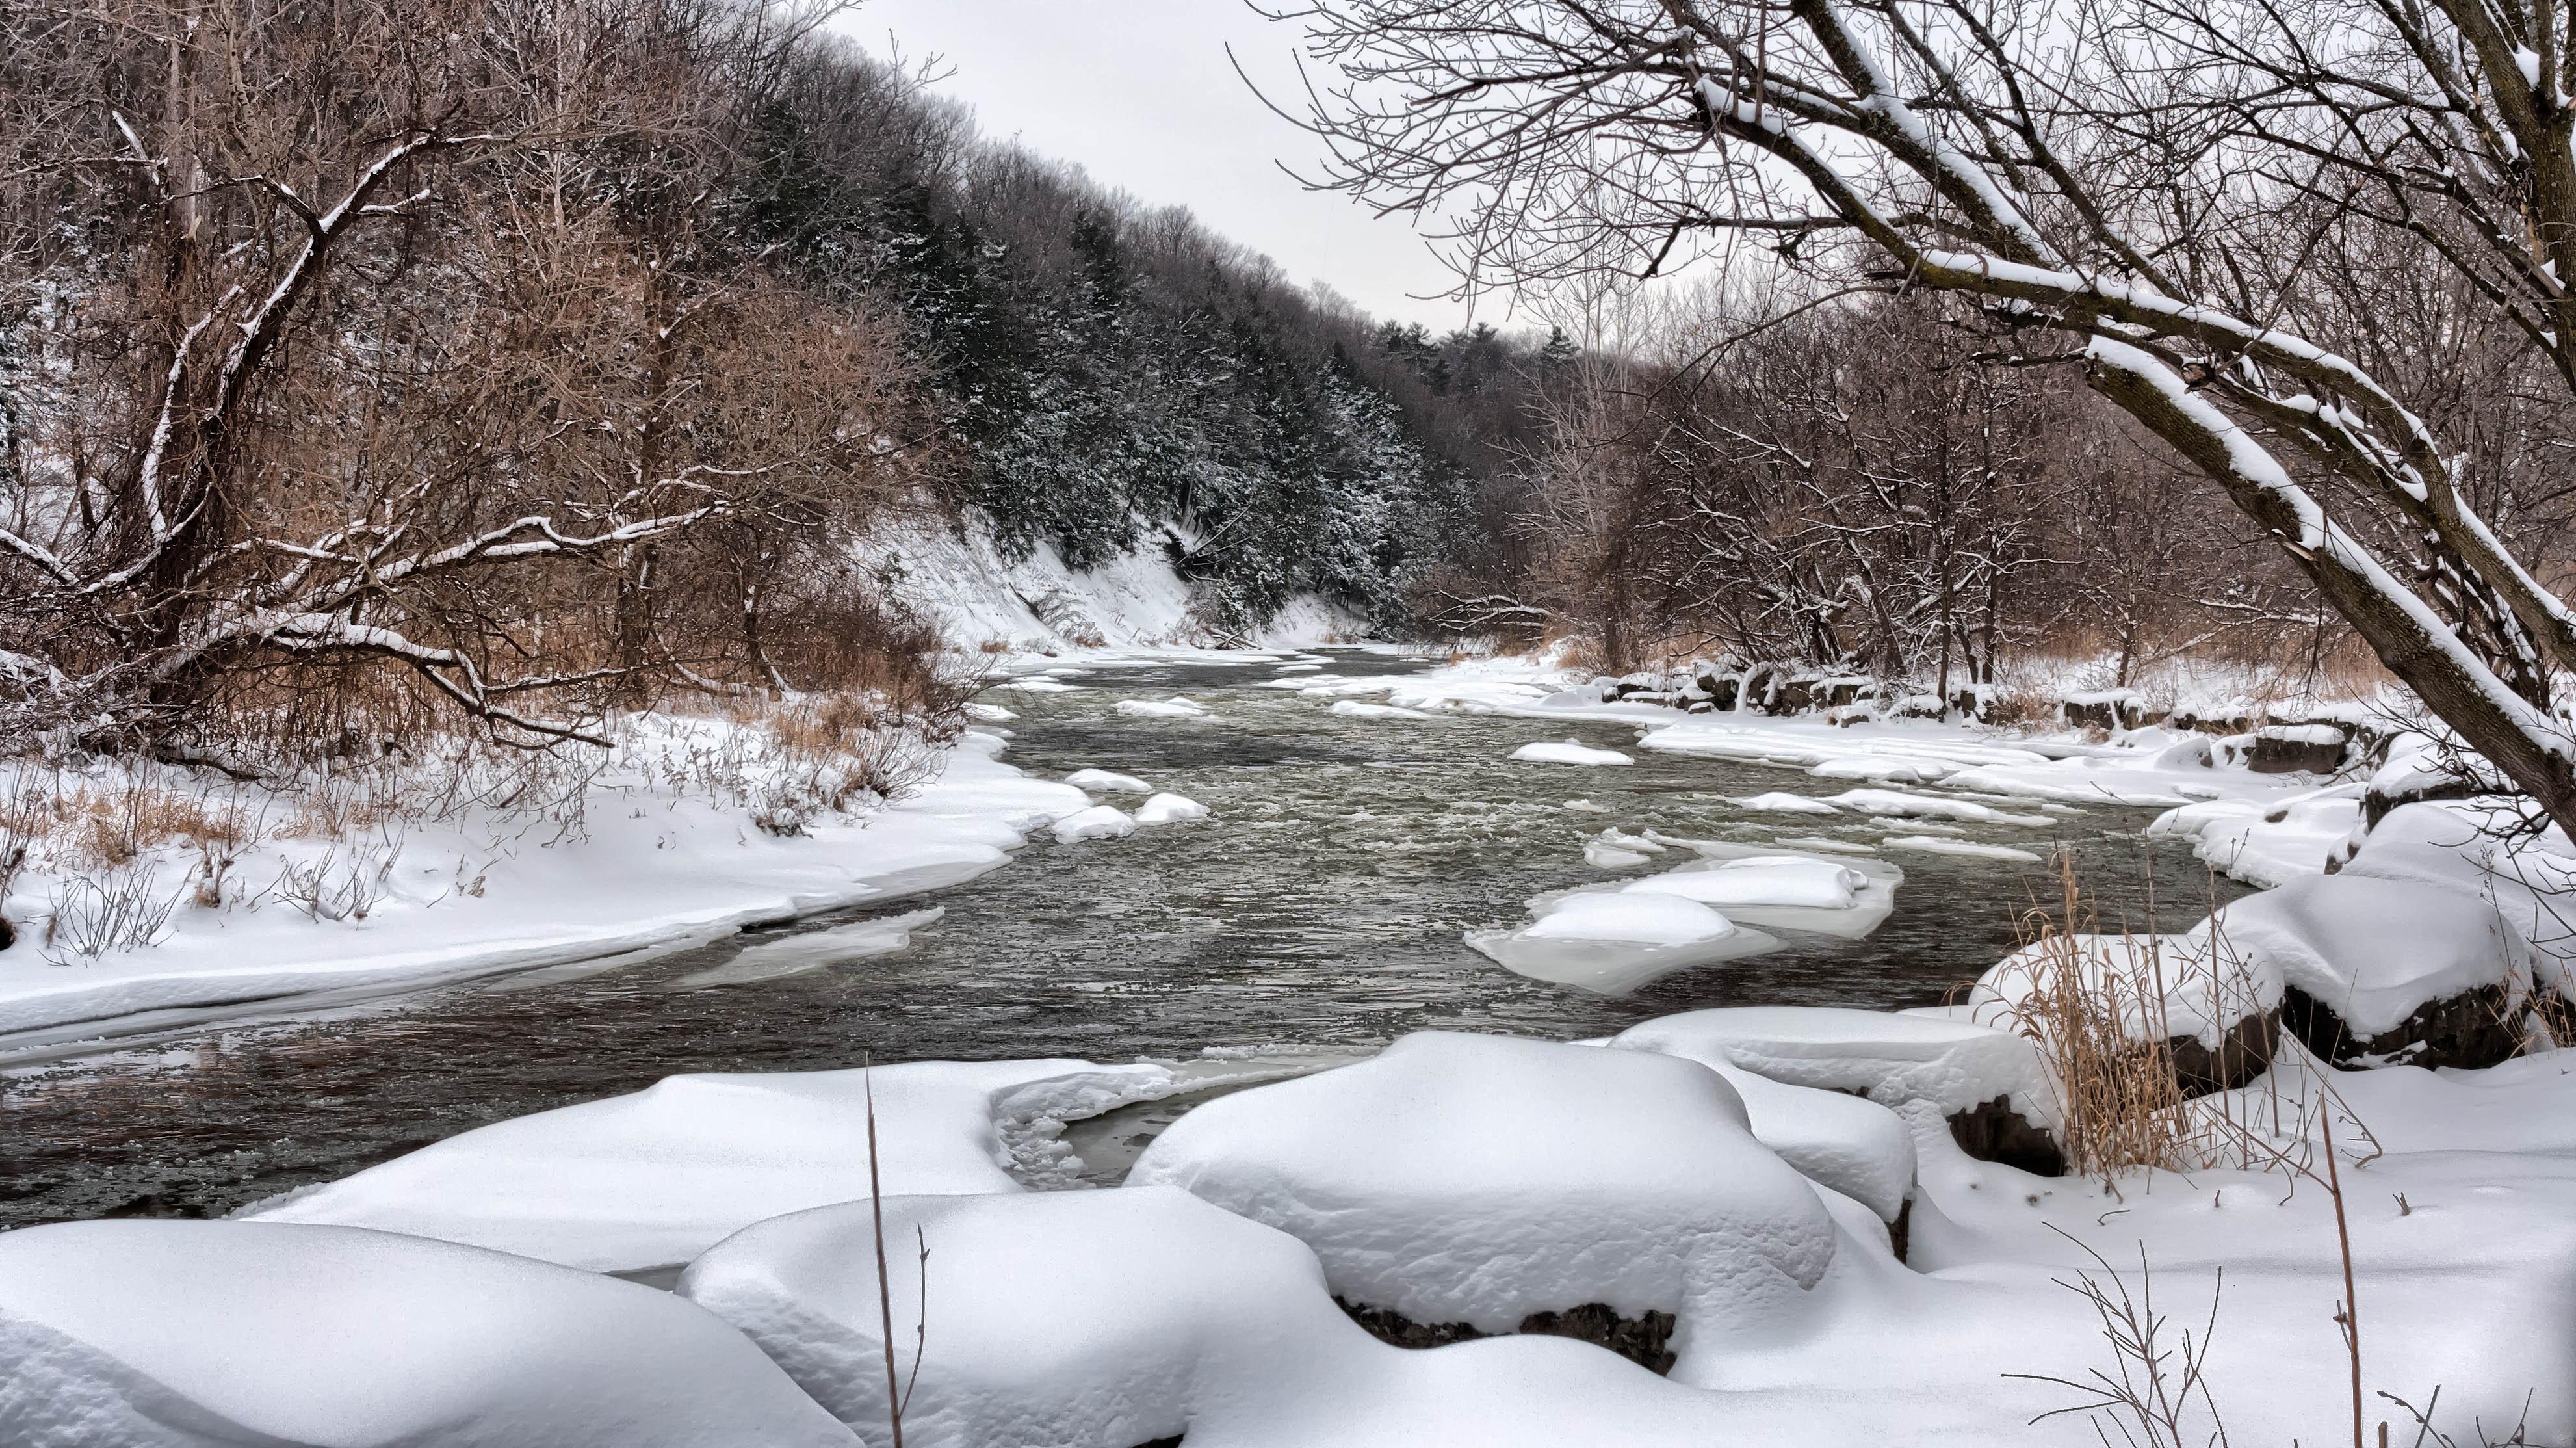 cold-river-snow-149547.jpg